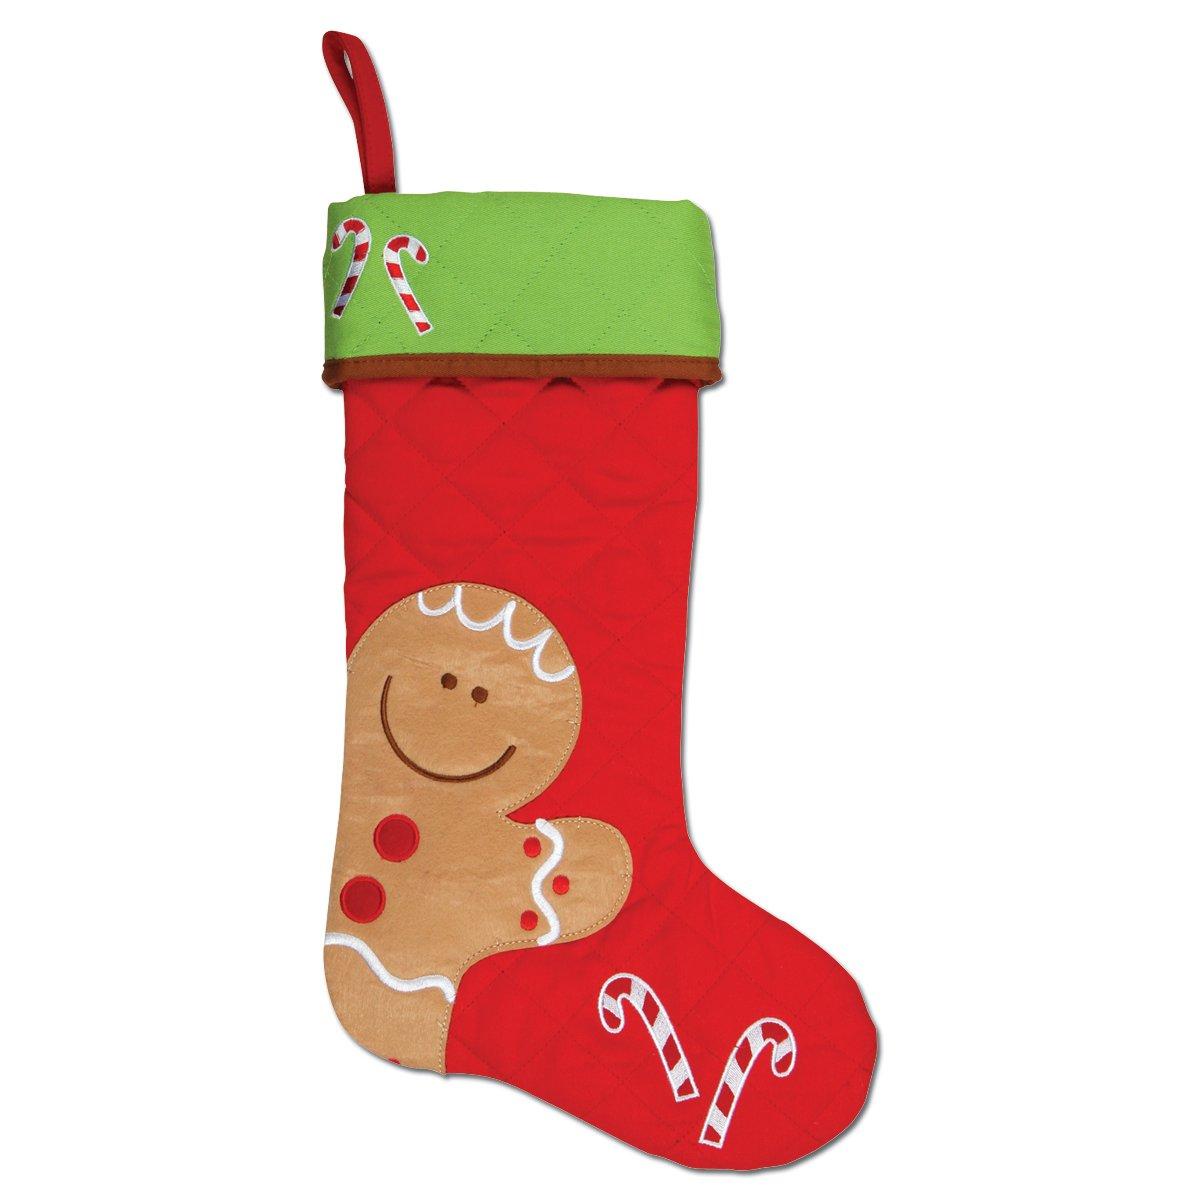 Amazon.com: Stephen Joseph Christmas Stocking, Dino: Toys & Games